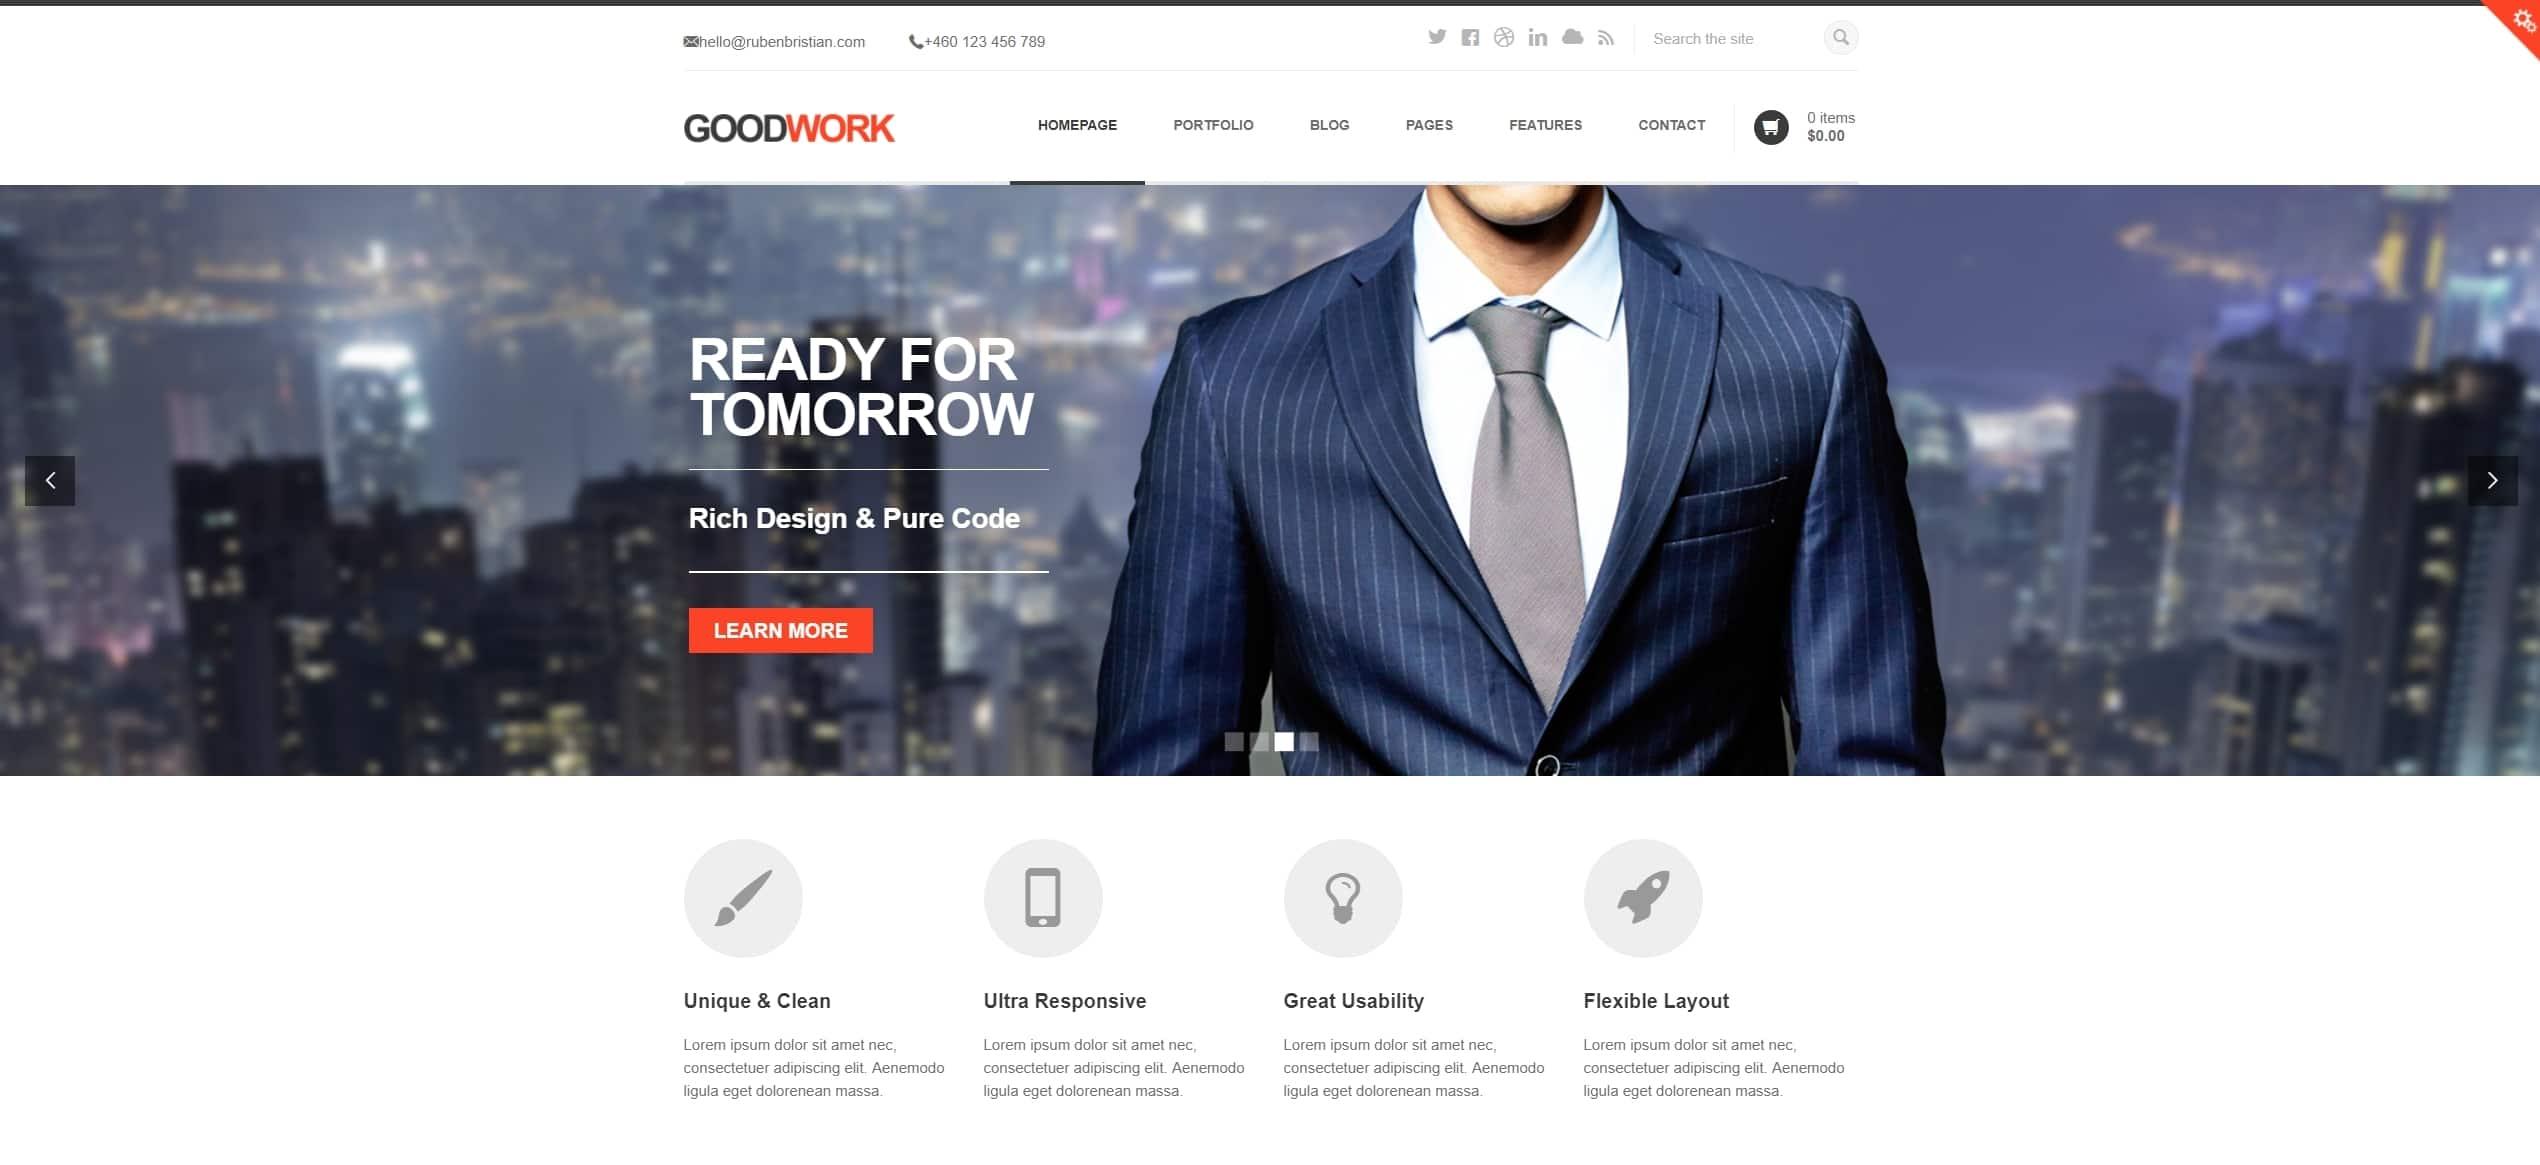 WordPress краудфандинг: Создаем сайт для эффективного запуска стартапов